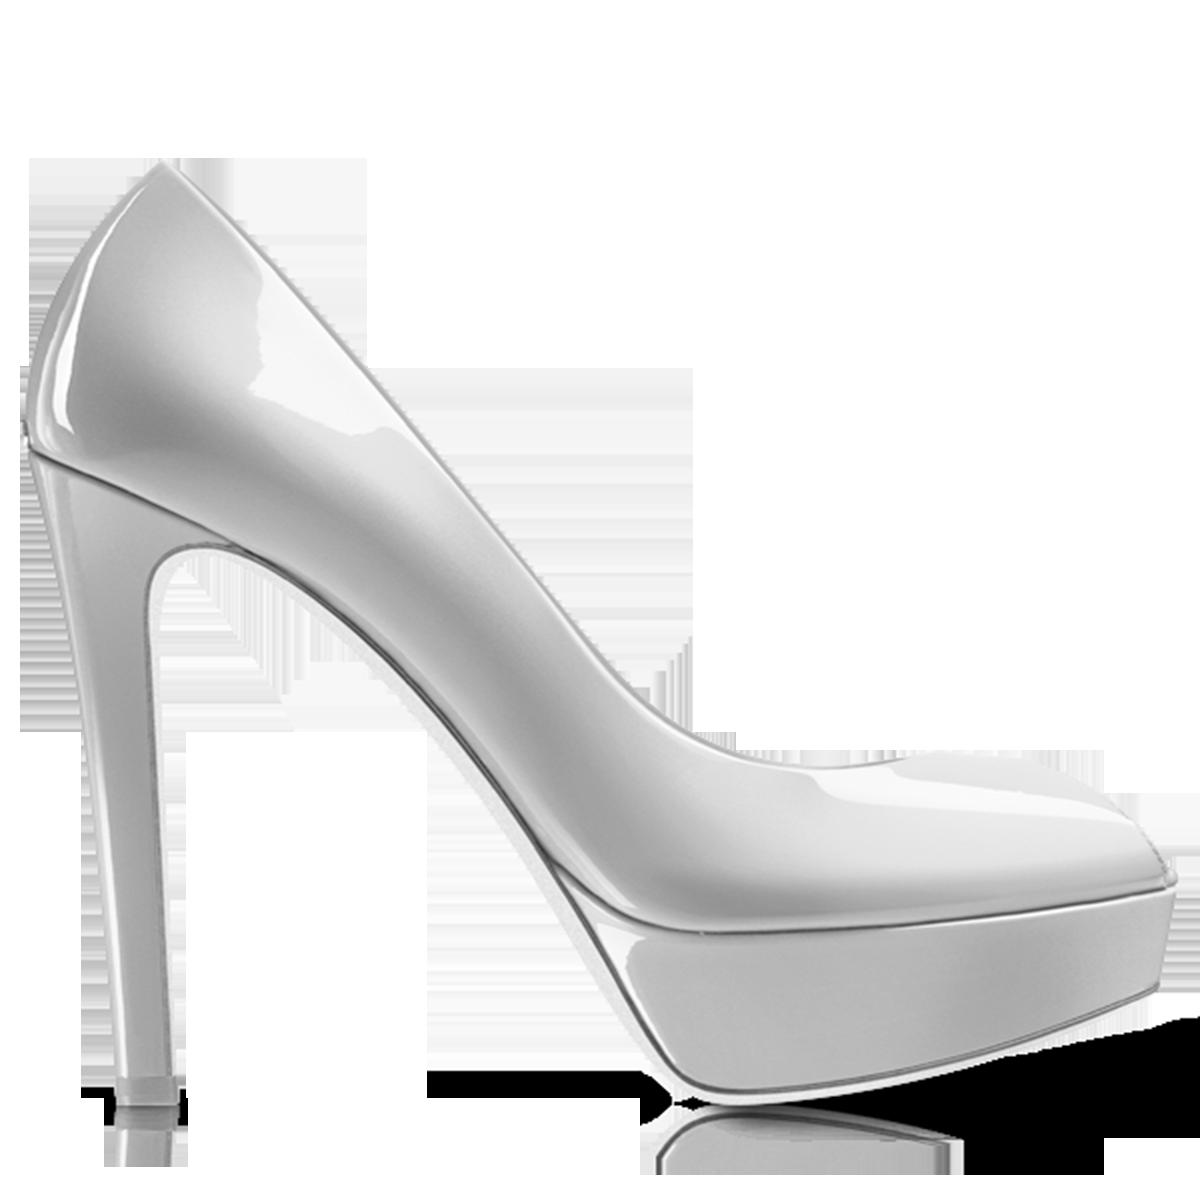 Heels clipart expensive shoe. Women shoes png image